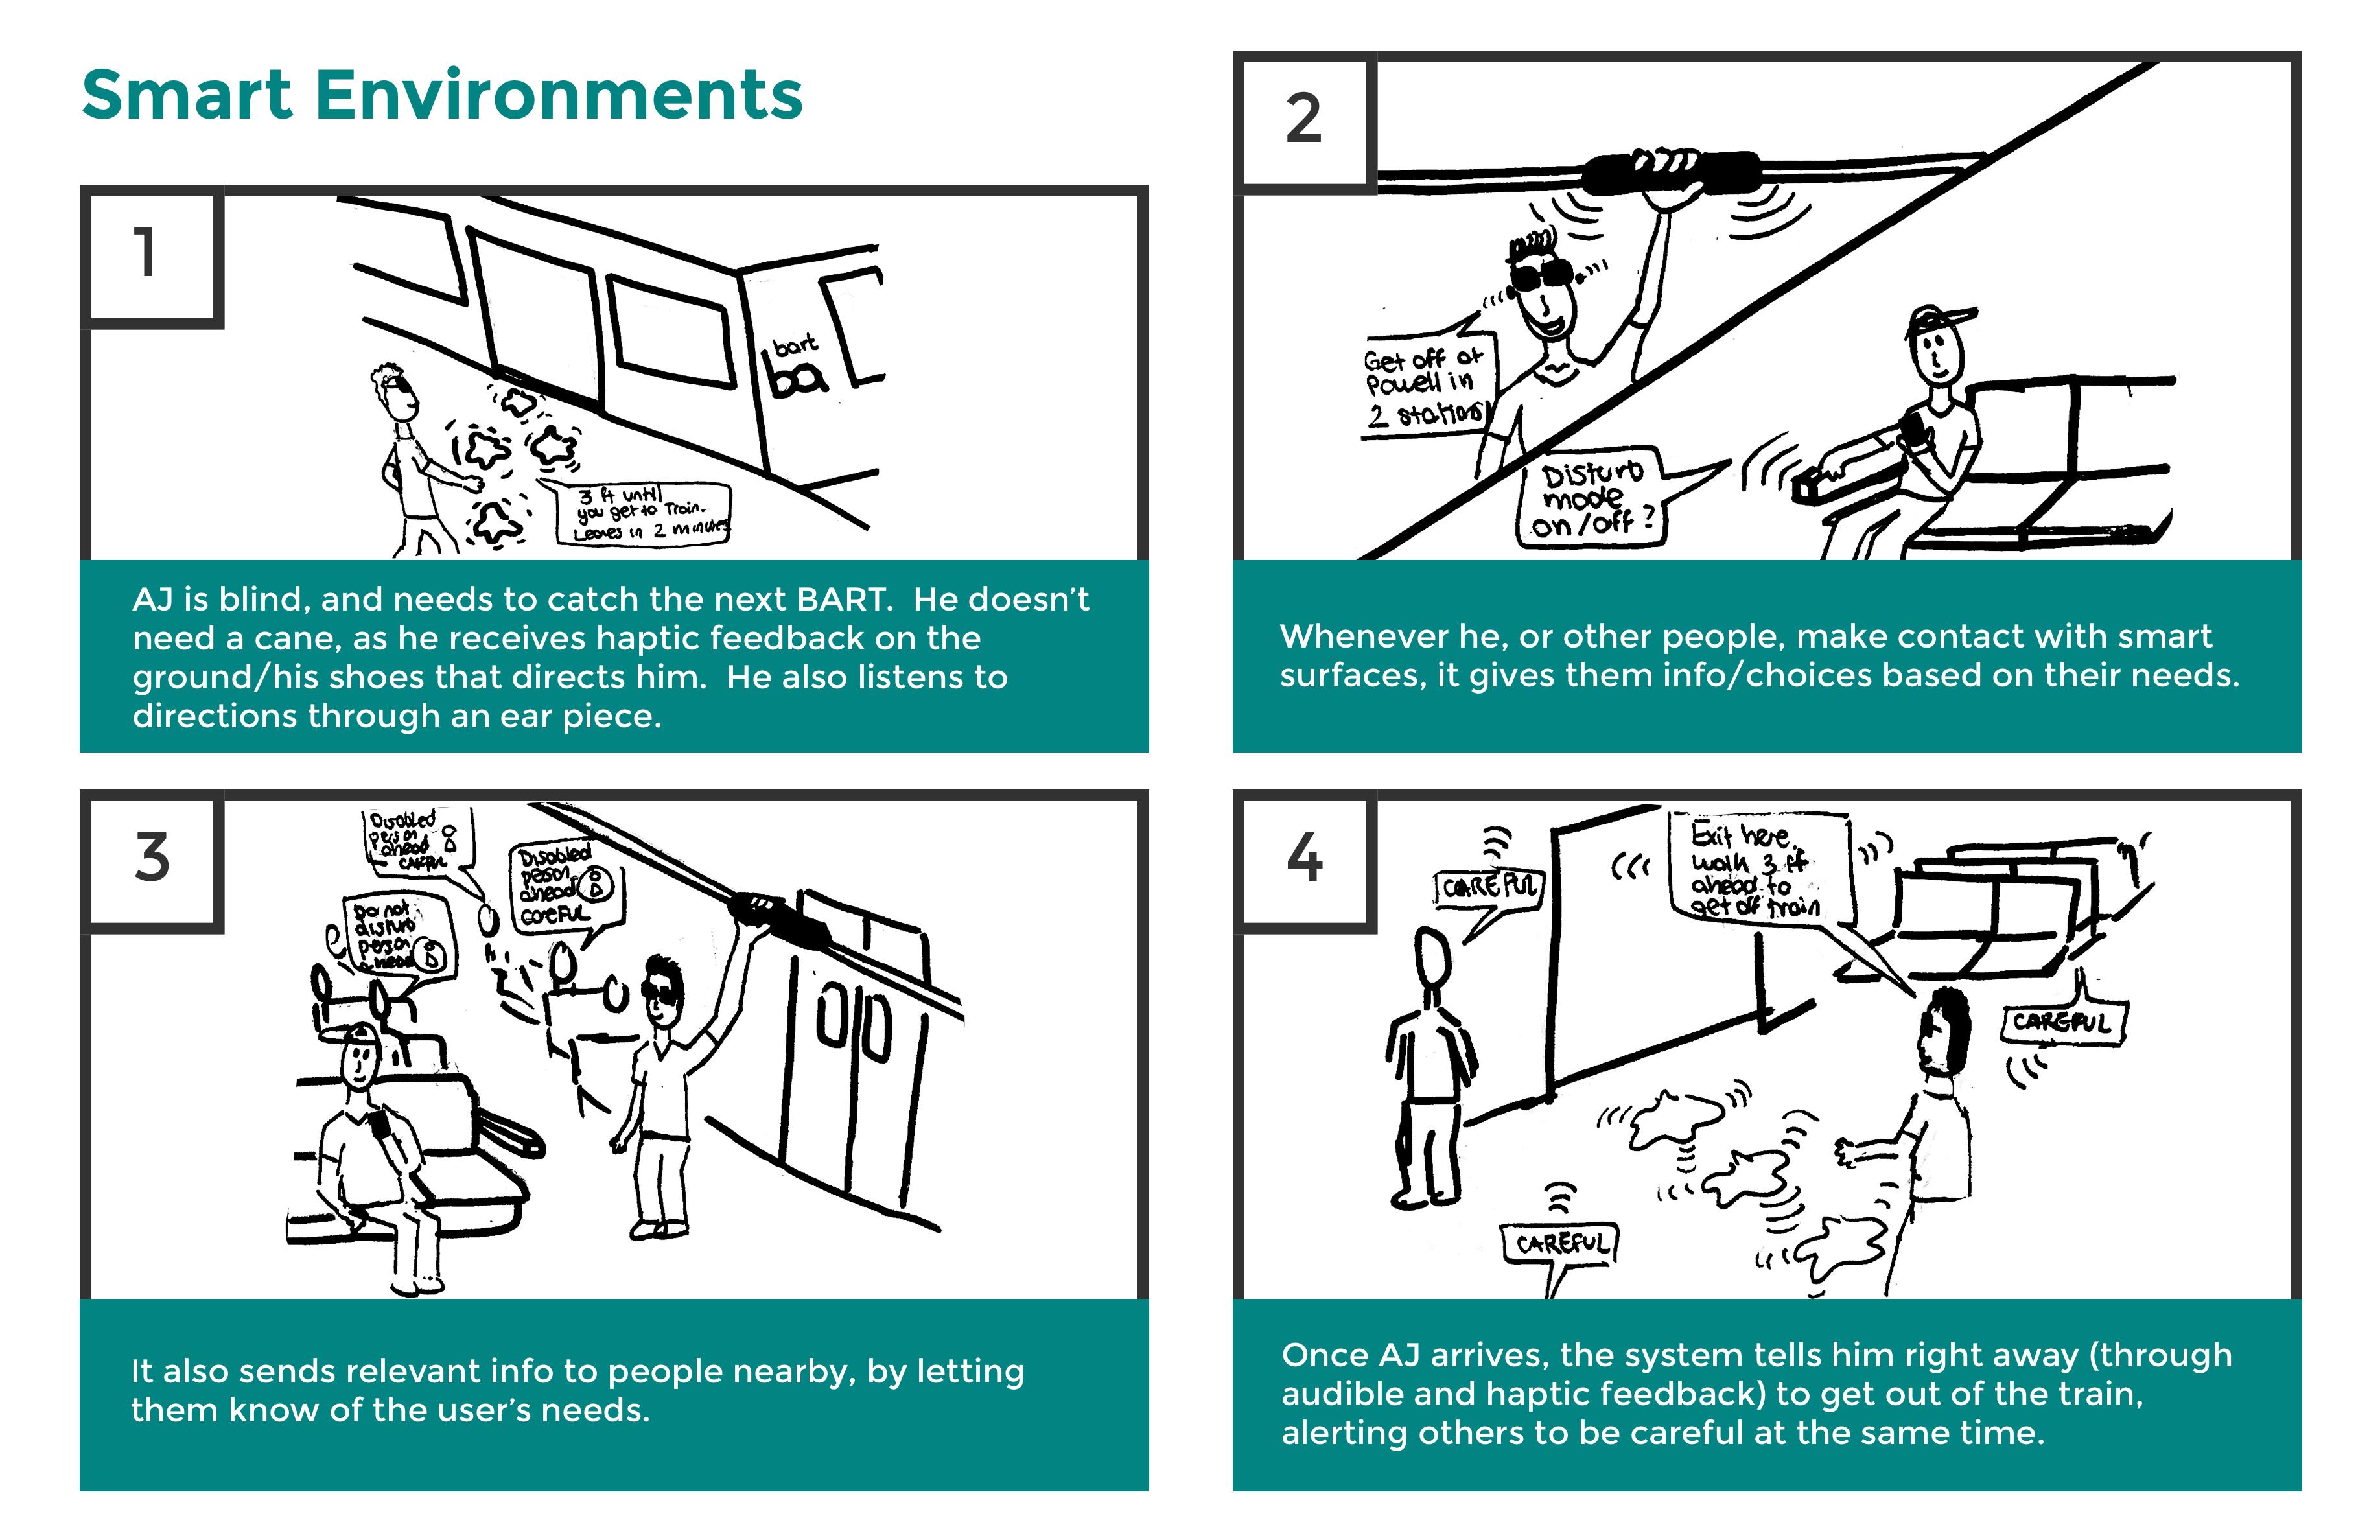 Smart Environments